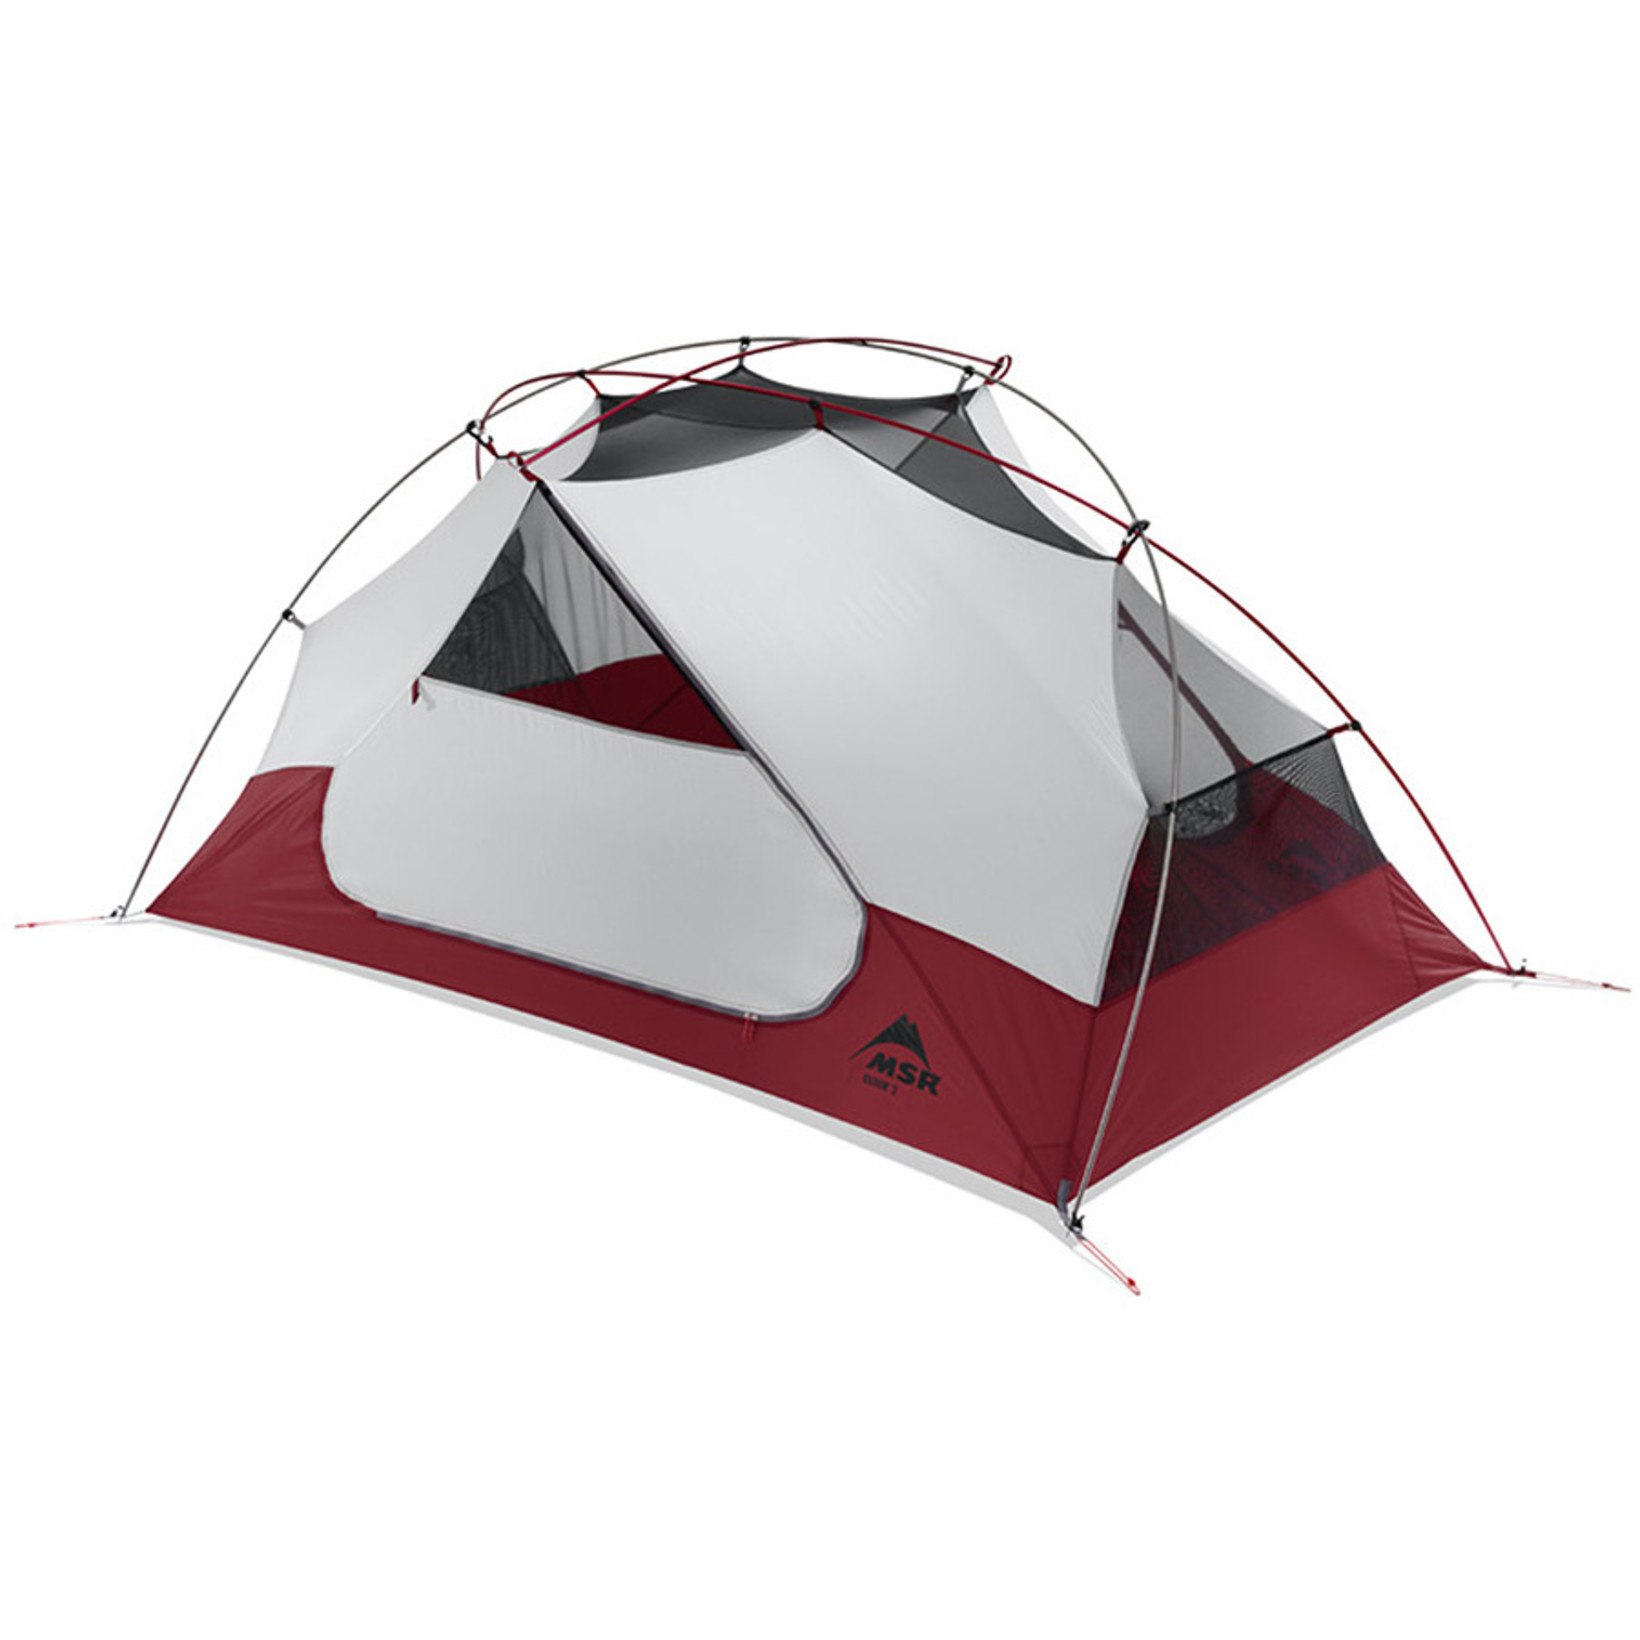 Elixir 3-Person Tent - no fly